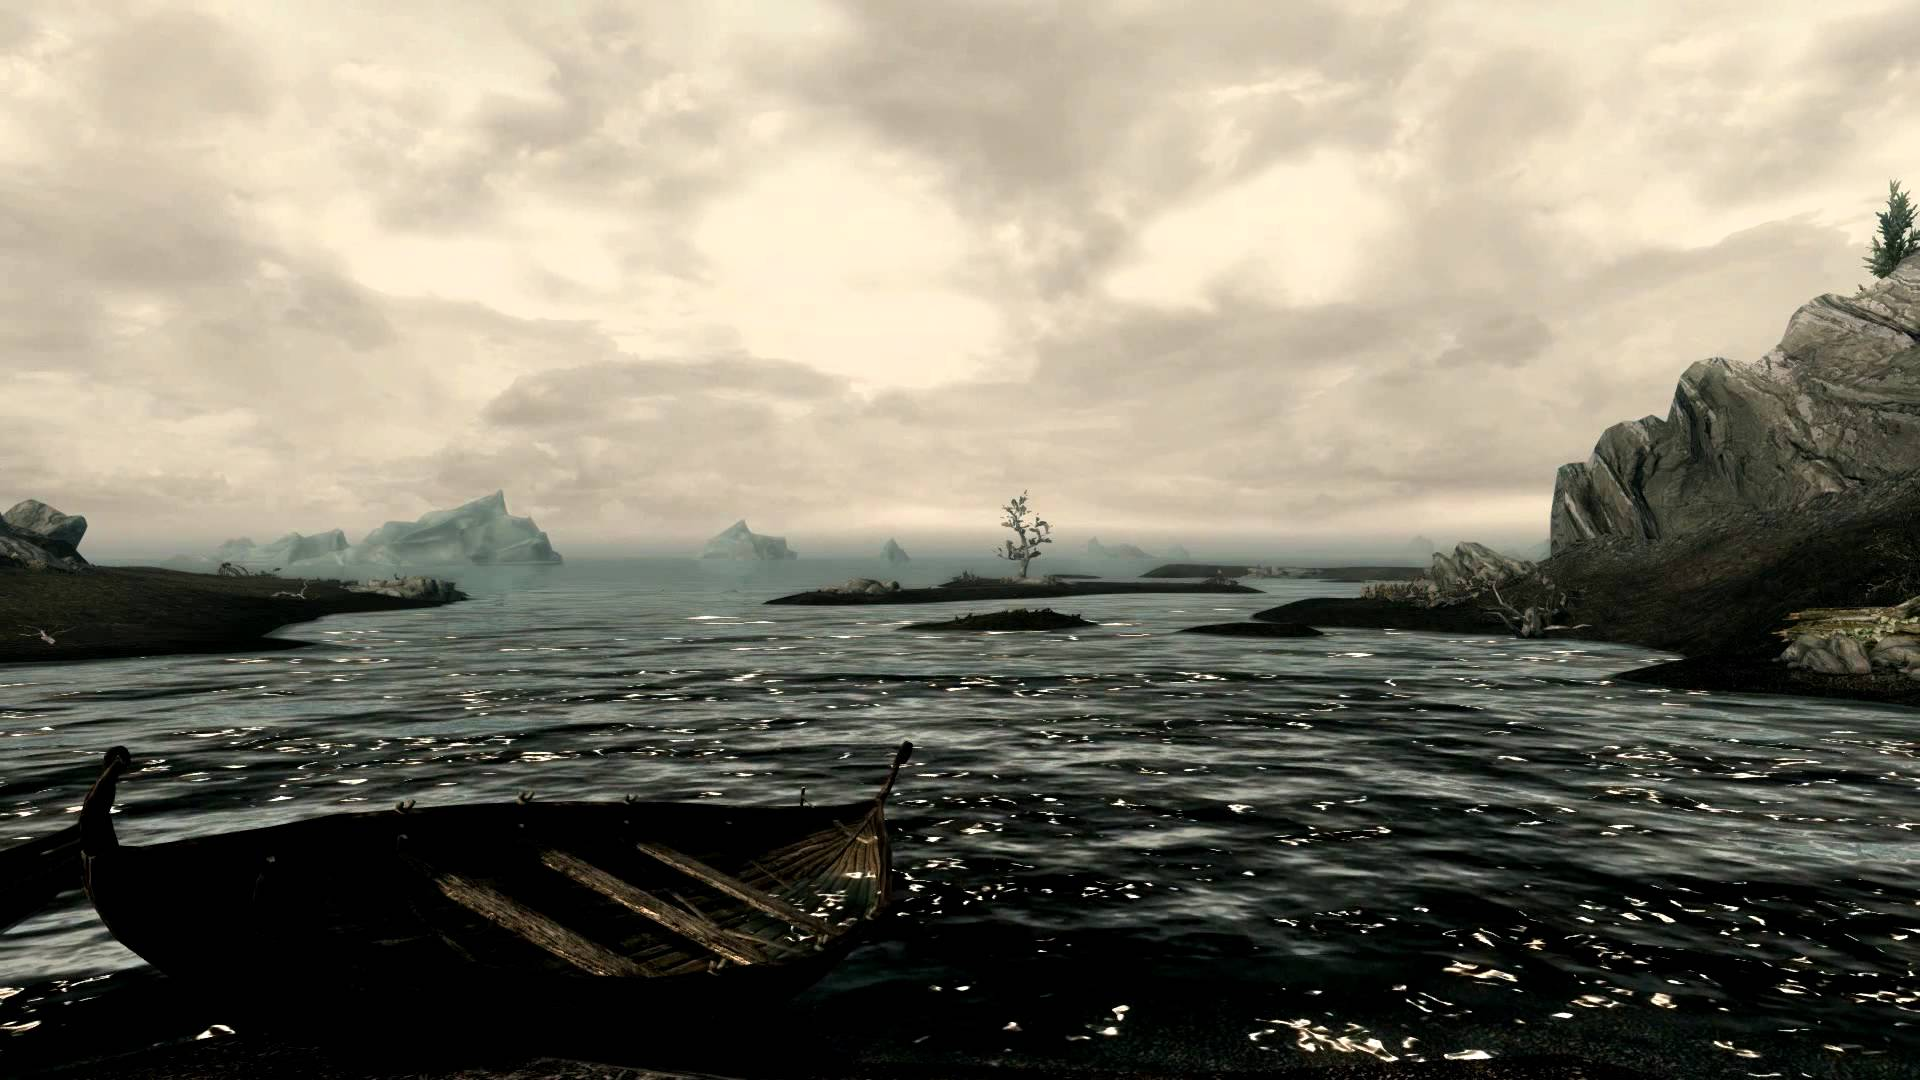 Skyrim Beautiful Shoreline 1 Video Desktop Wallpaper 1920x1080